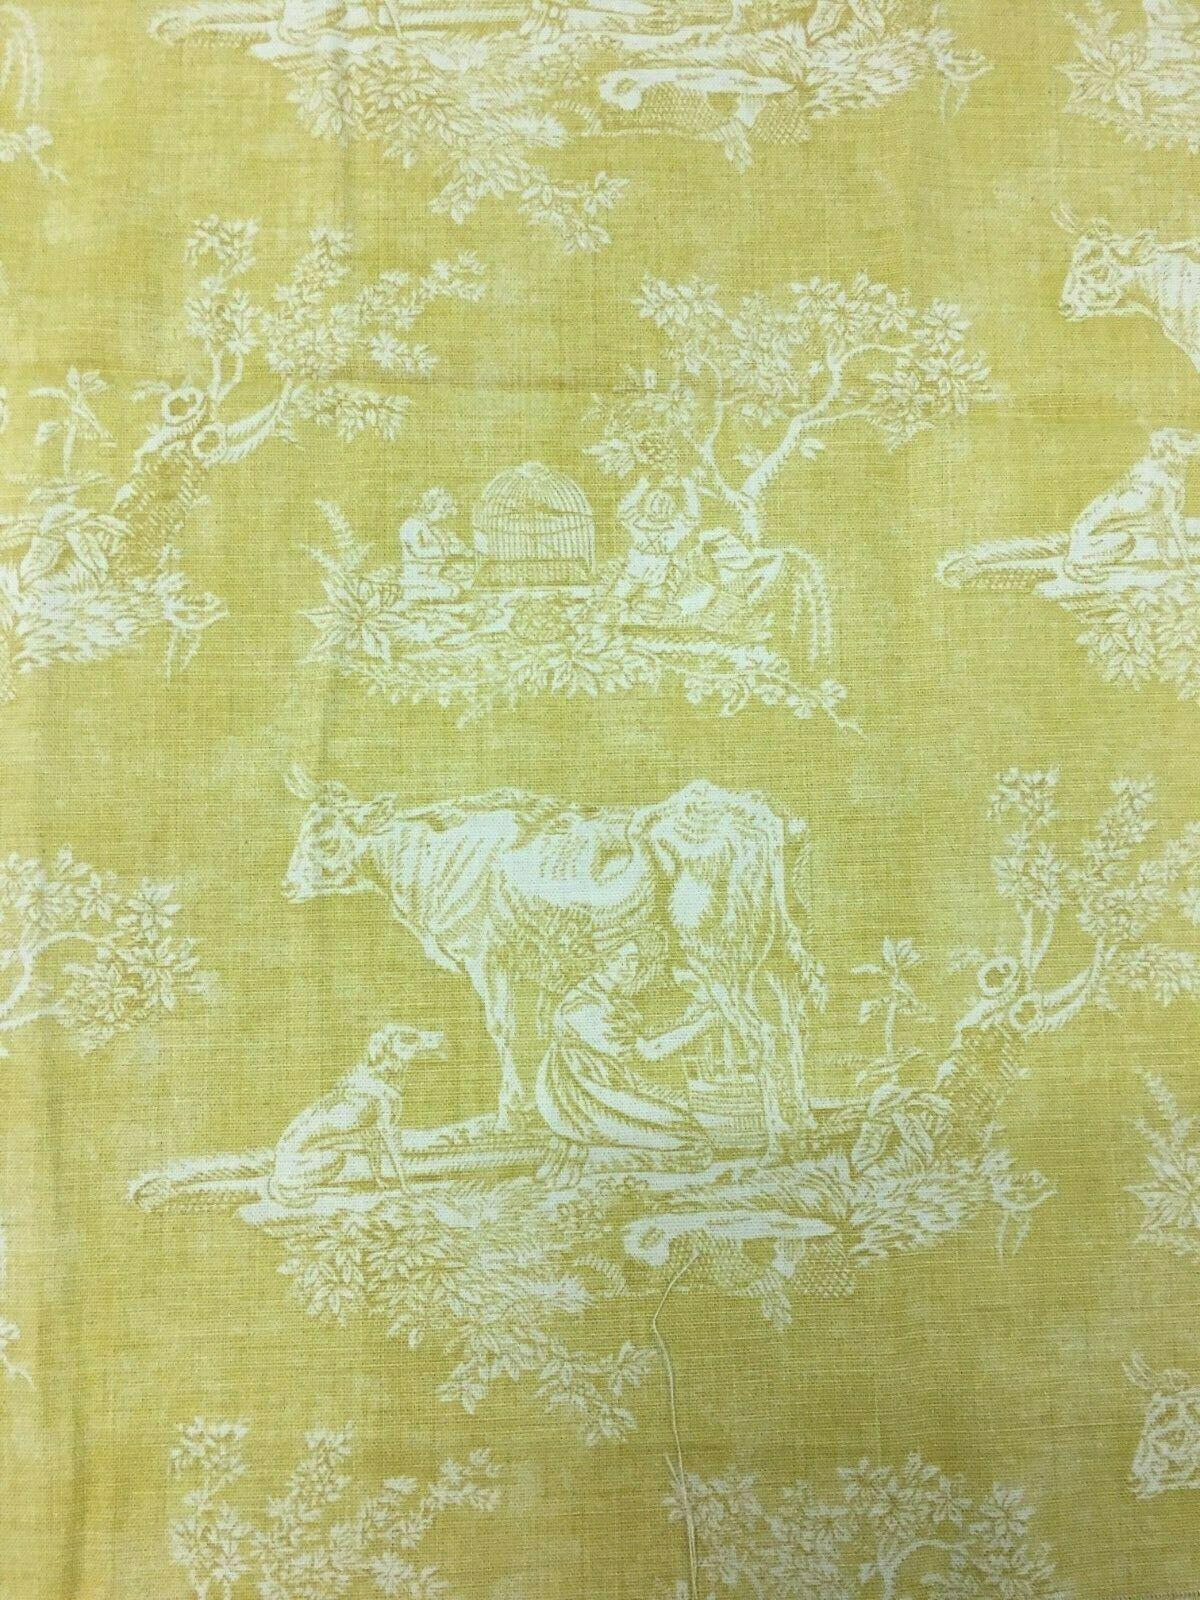 Waverly Mayenne Yellow Cotton Toile with Cows Multi-Purpose Fabric 1.375 yards